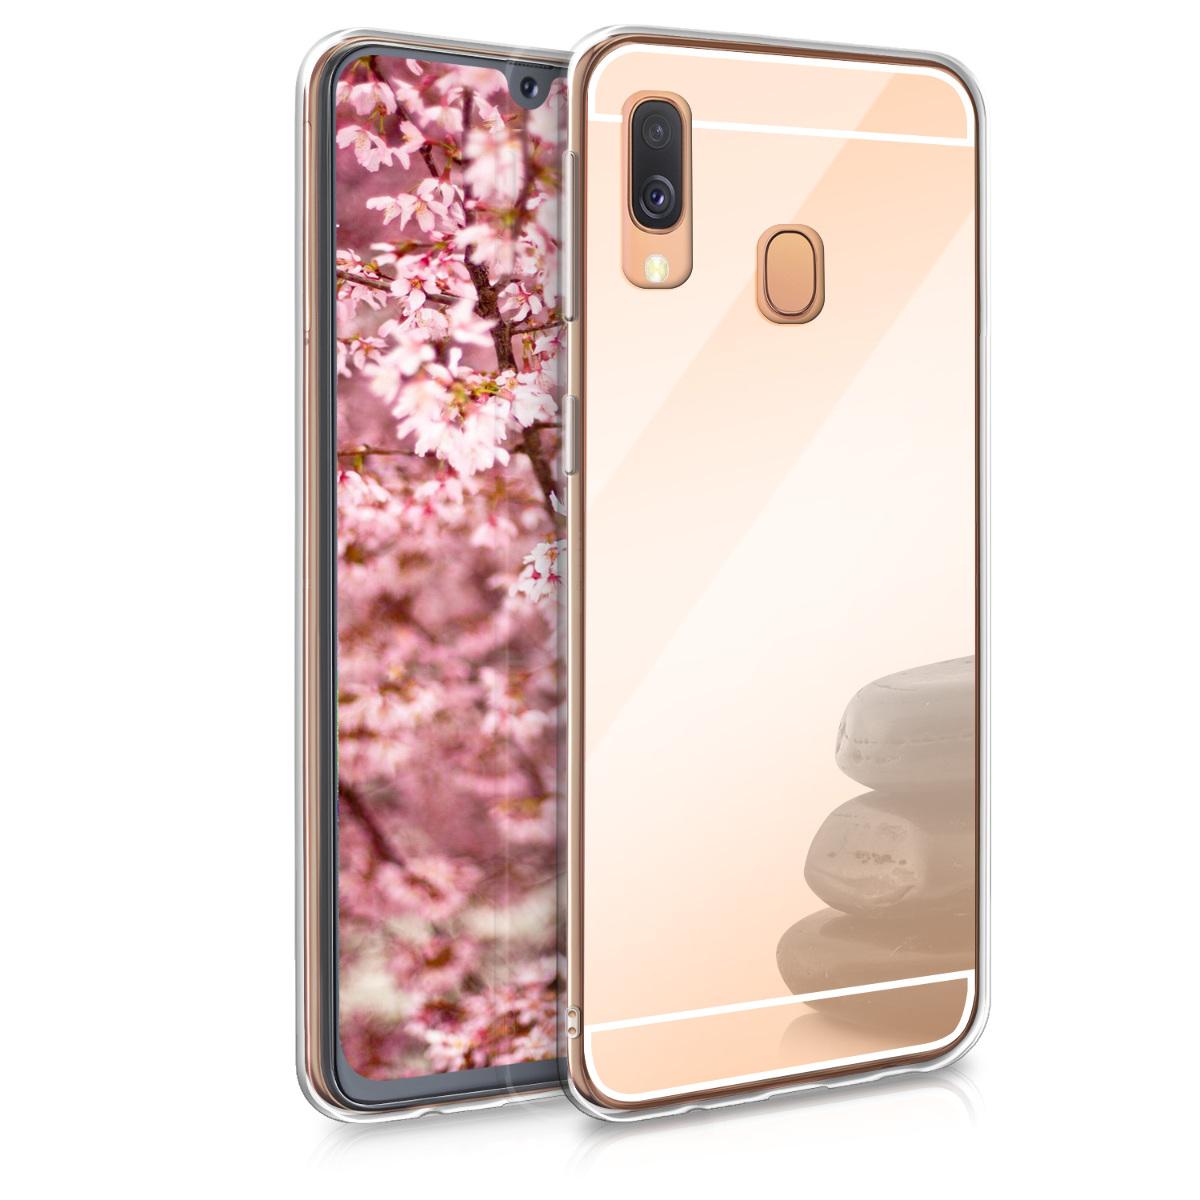 KW Θήκη Σιλικόνης (TPU) με Καθρέφτη Samsung Galaxy A40 - Rose Gold Reflective (49217.41)